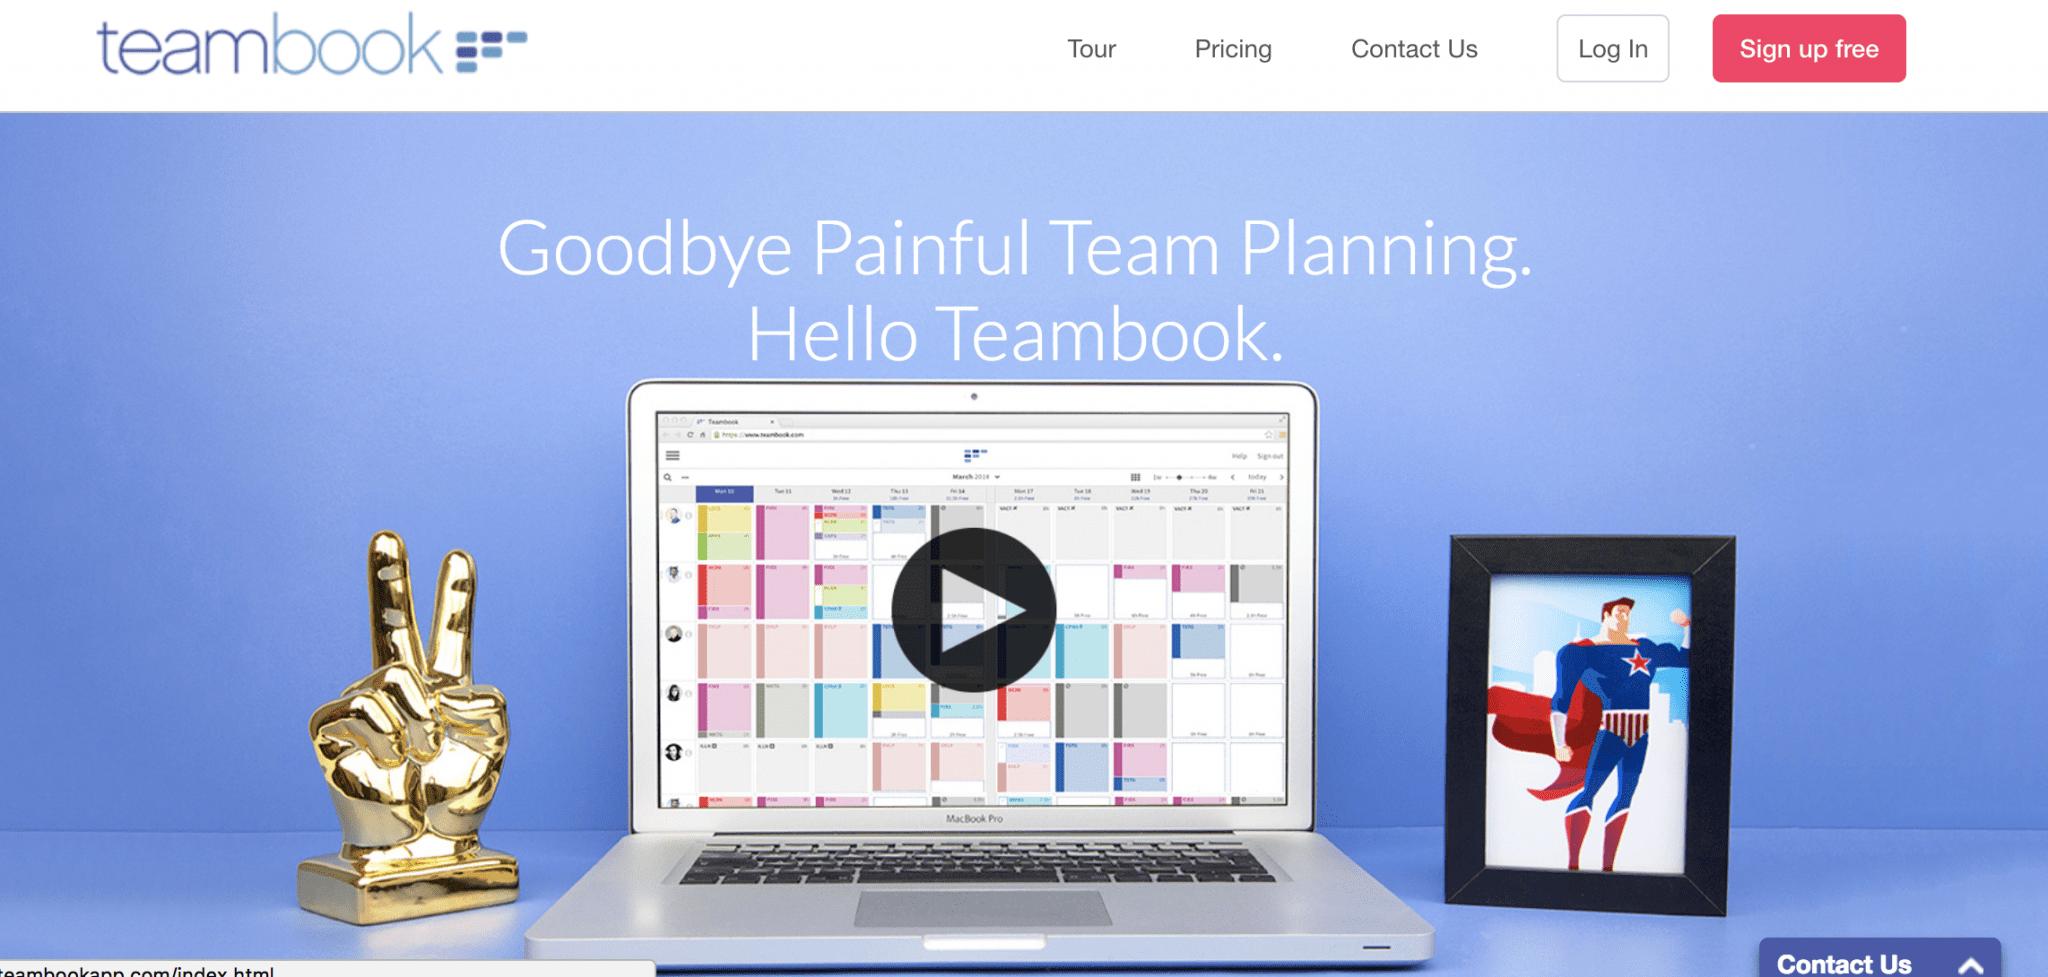 TeamBookCalendarIntegration